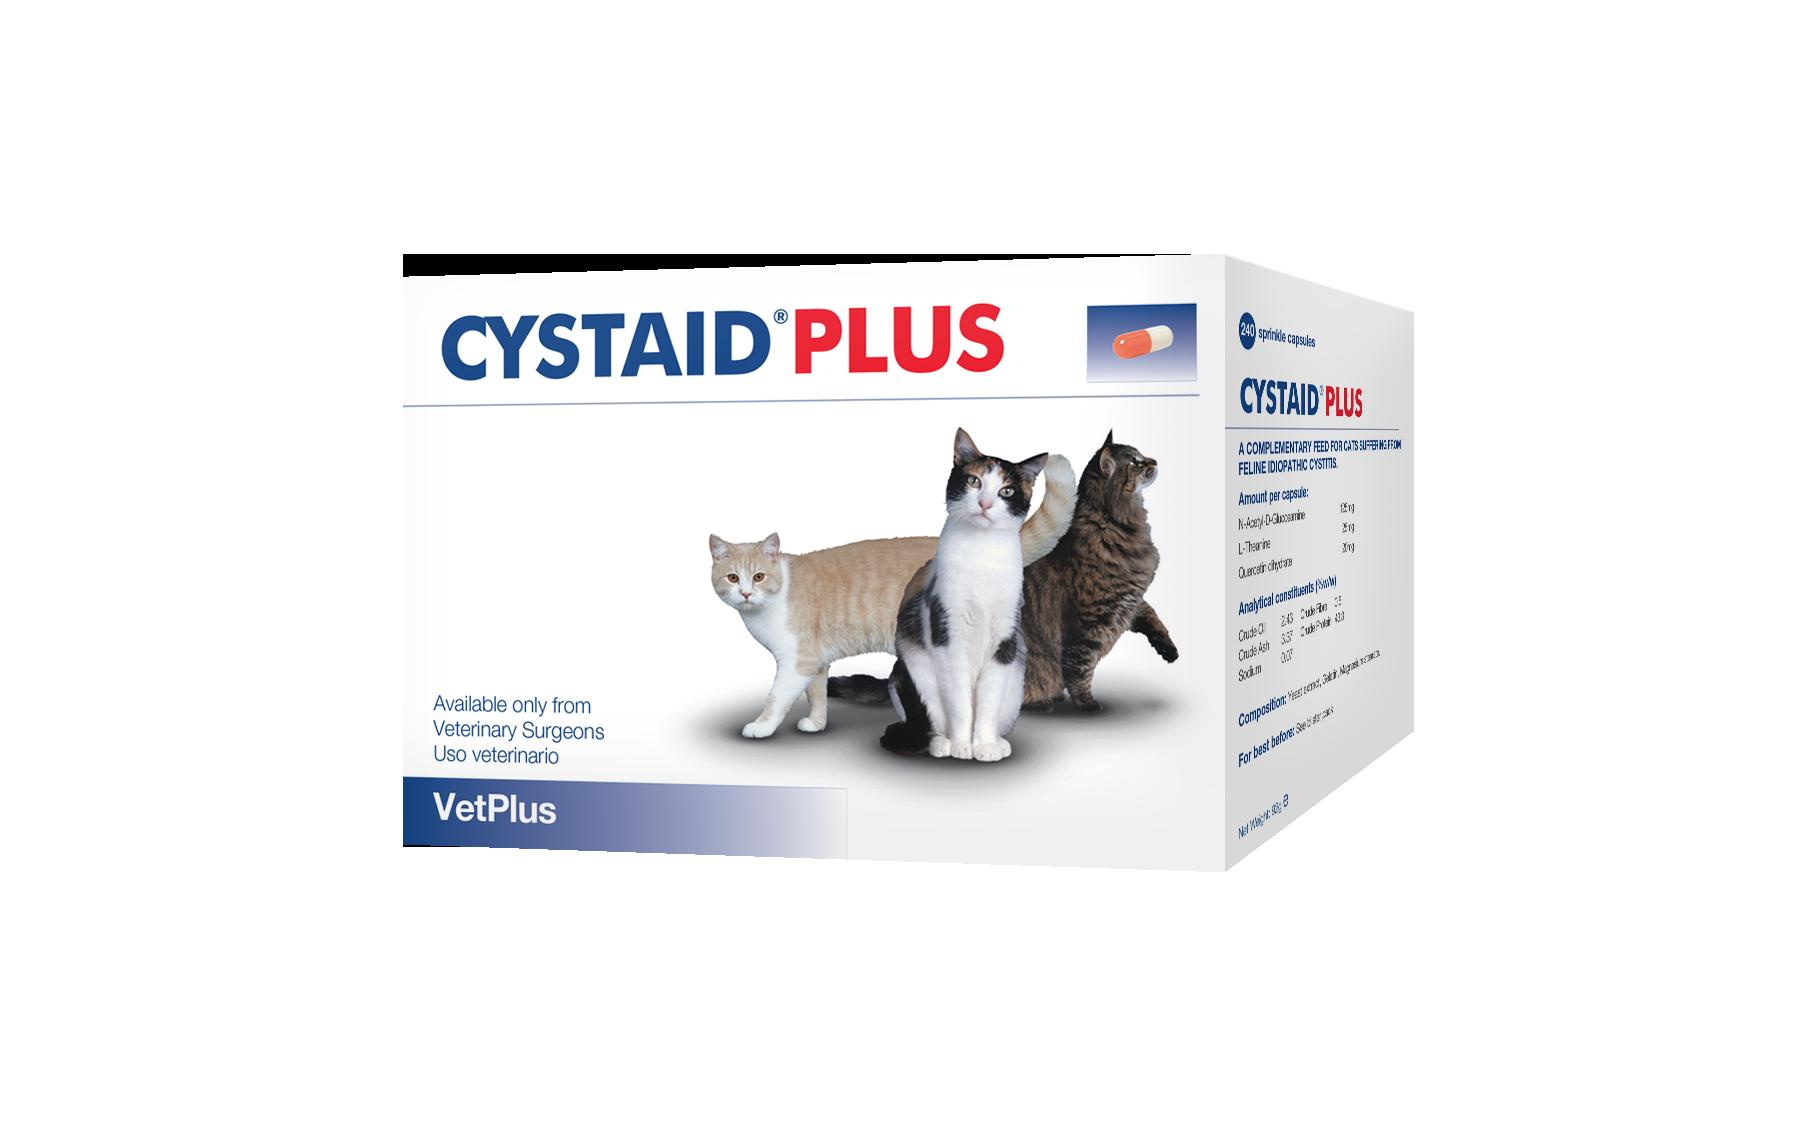 Cystaid Plus Vetplus